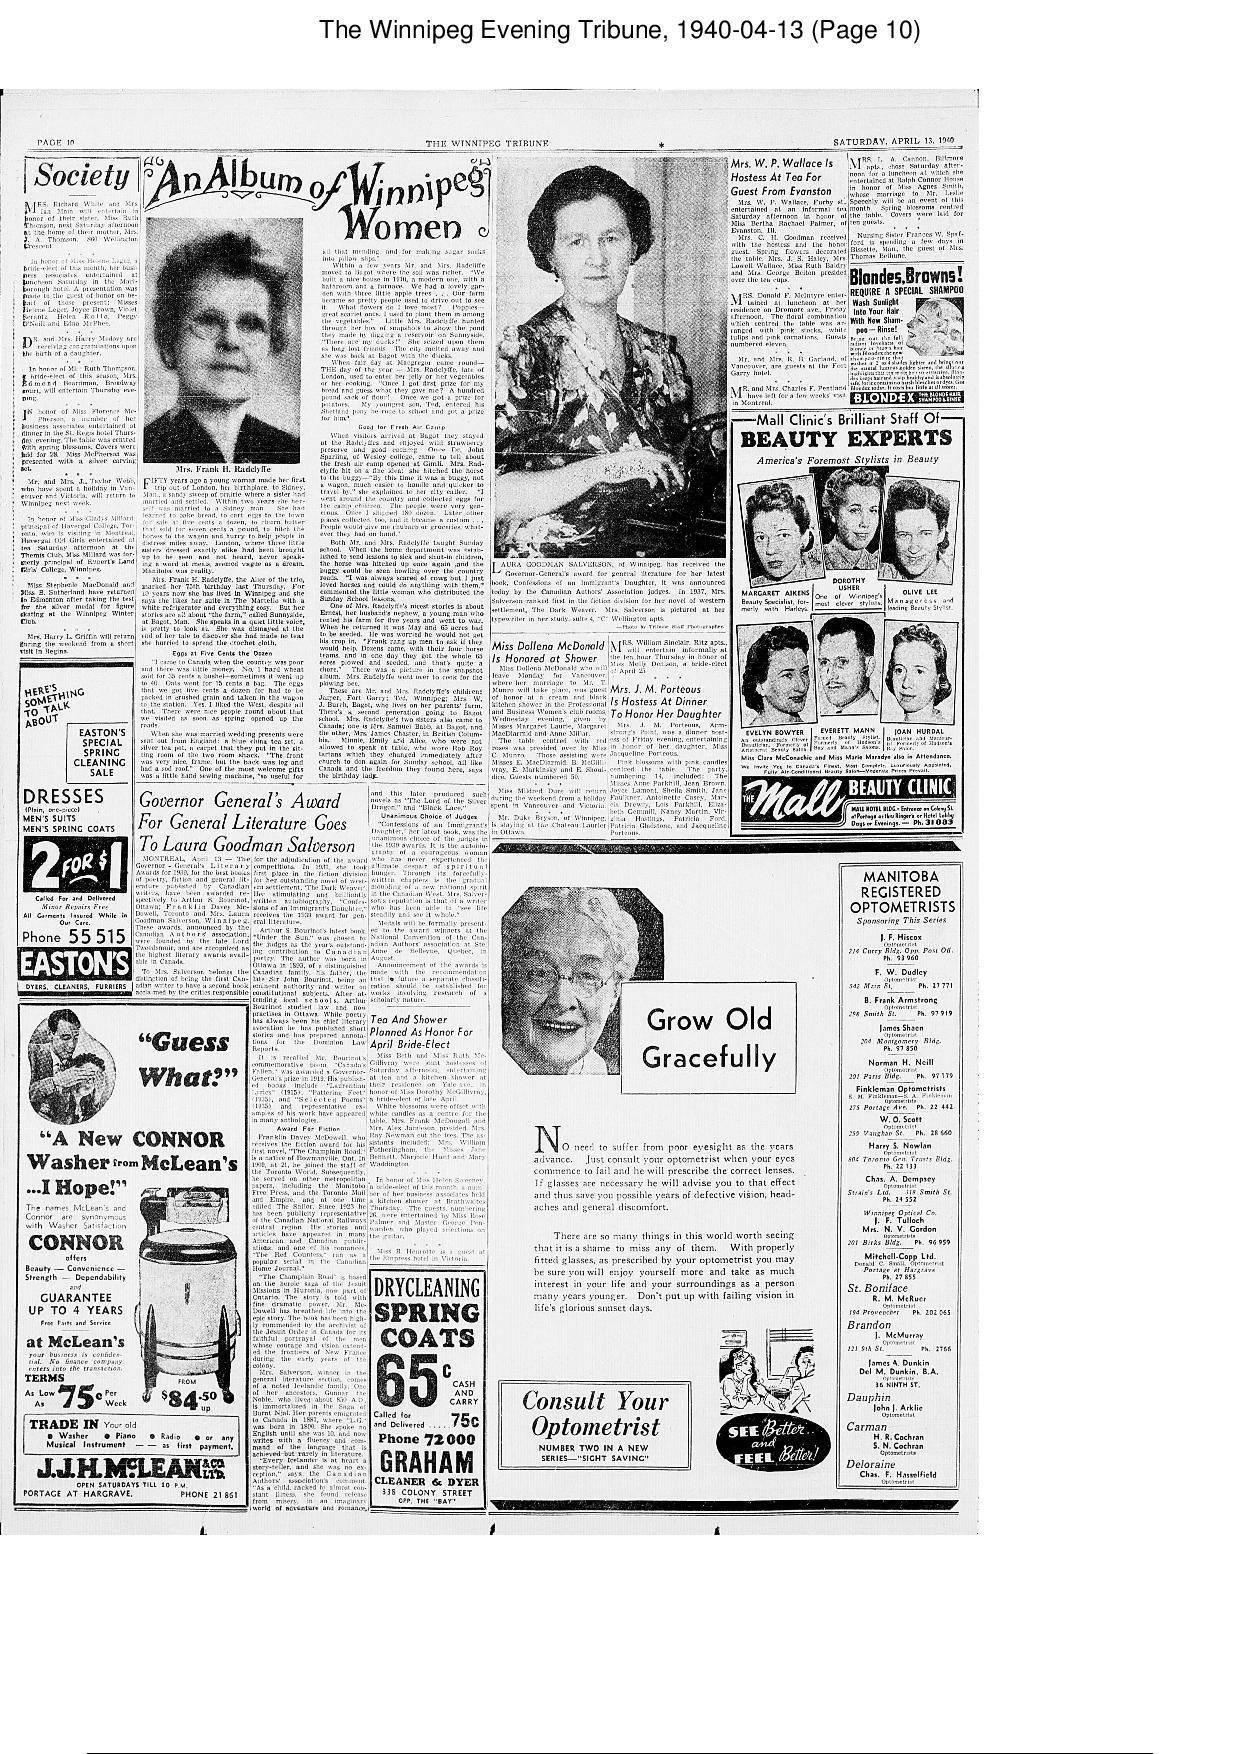 The Winnipeg Evening Tribune 1940 04 13 Page 10 page 001